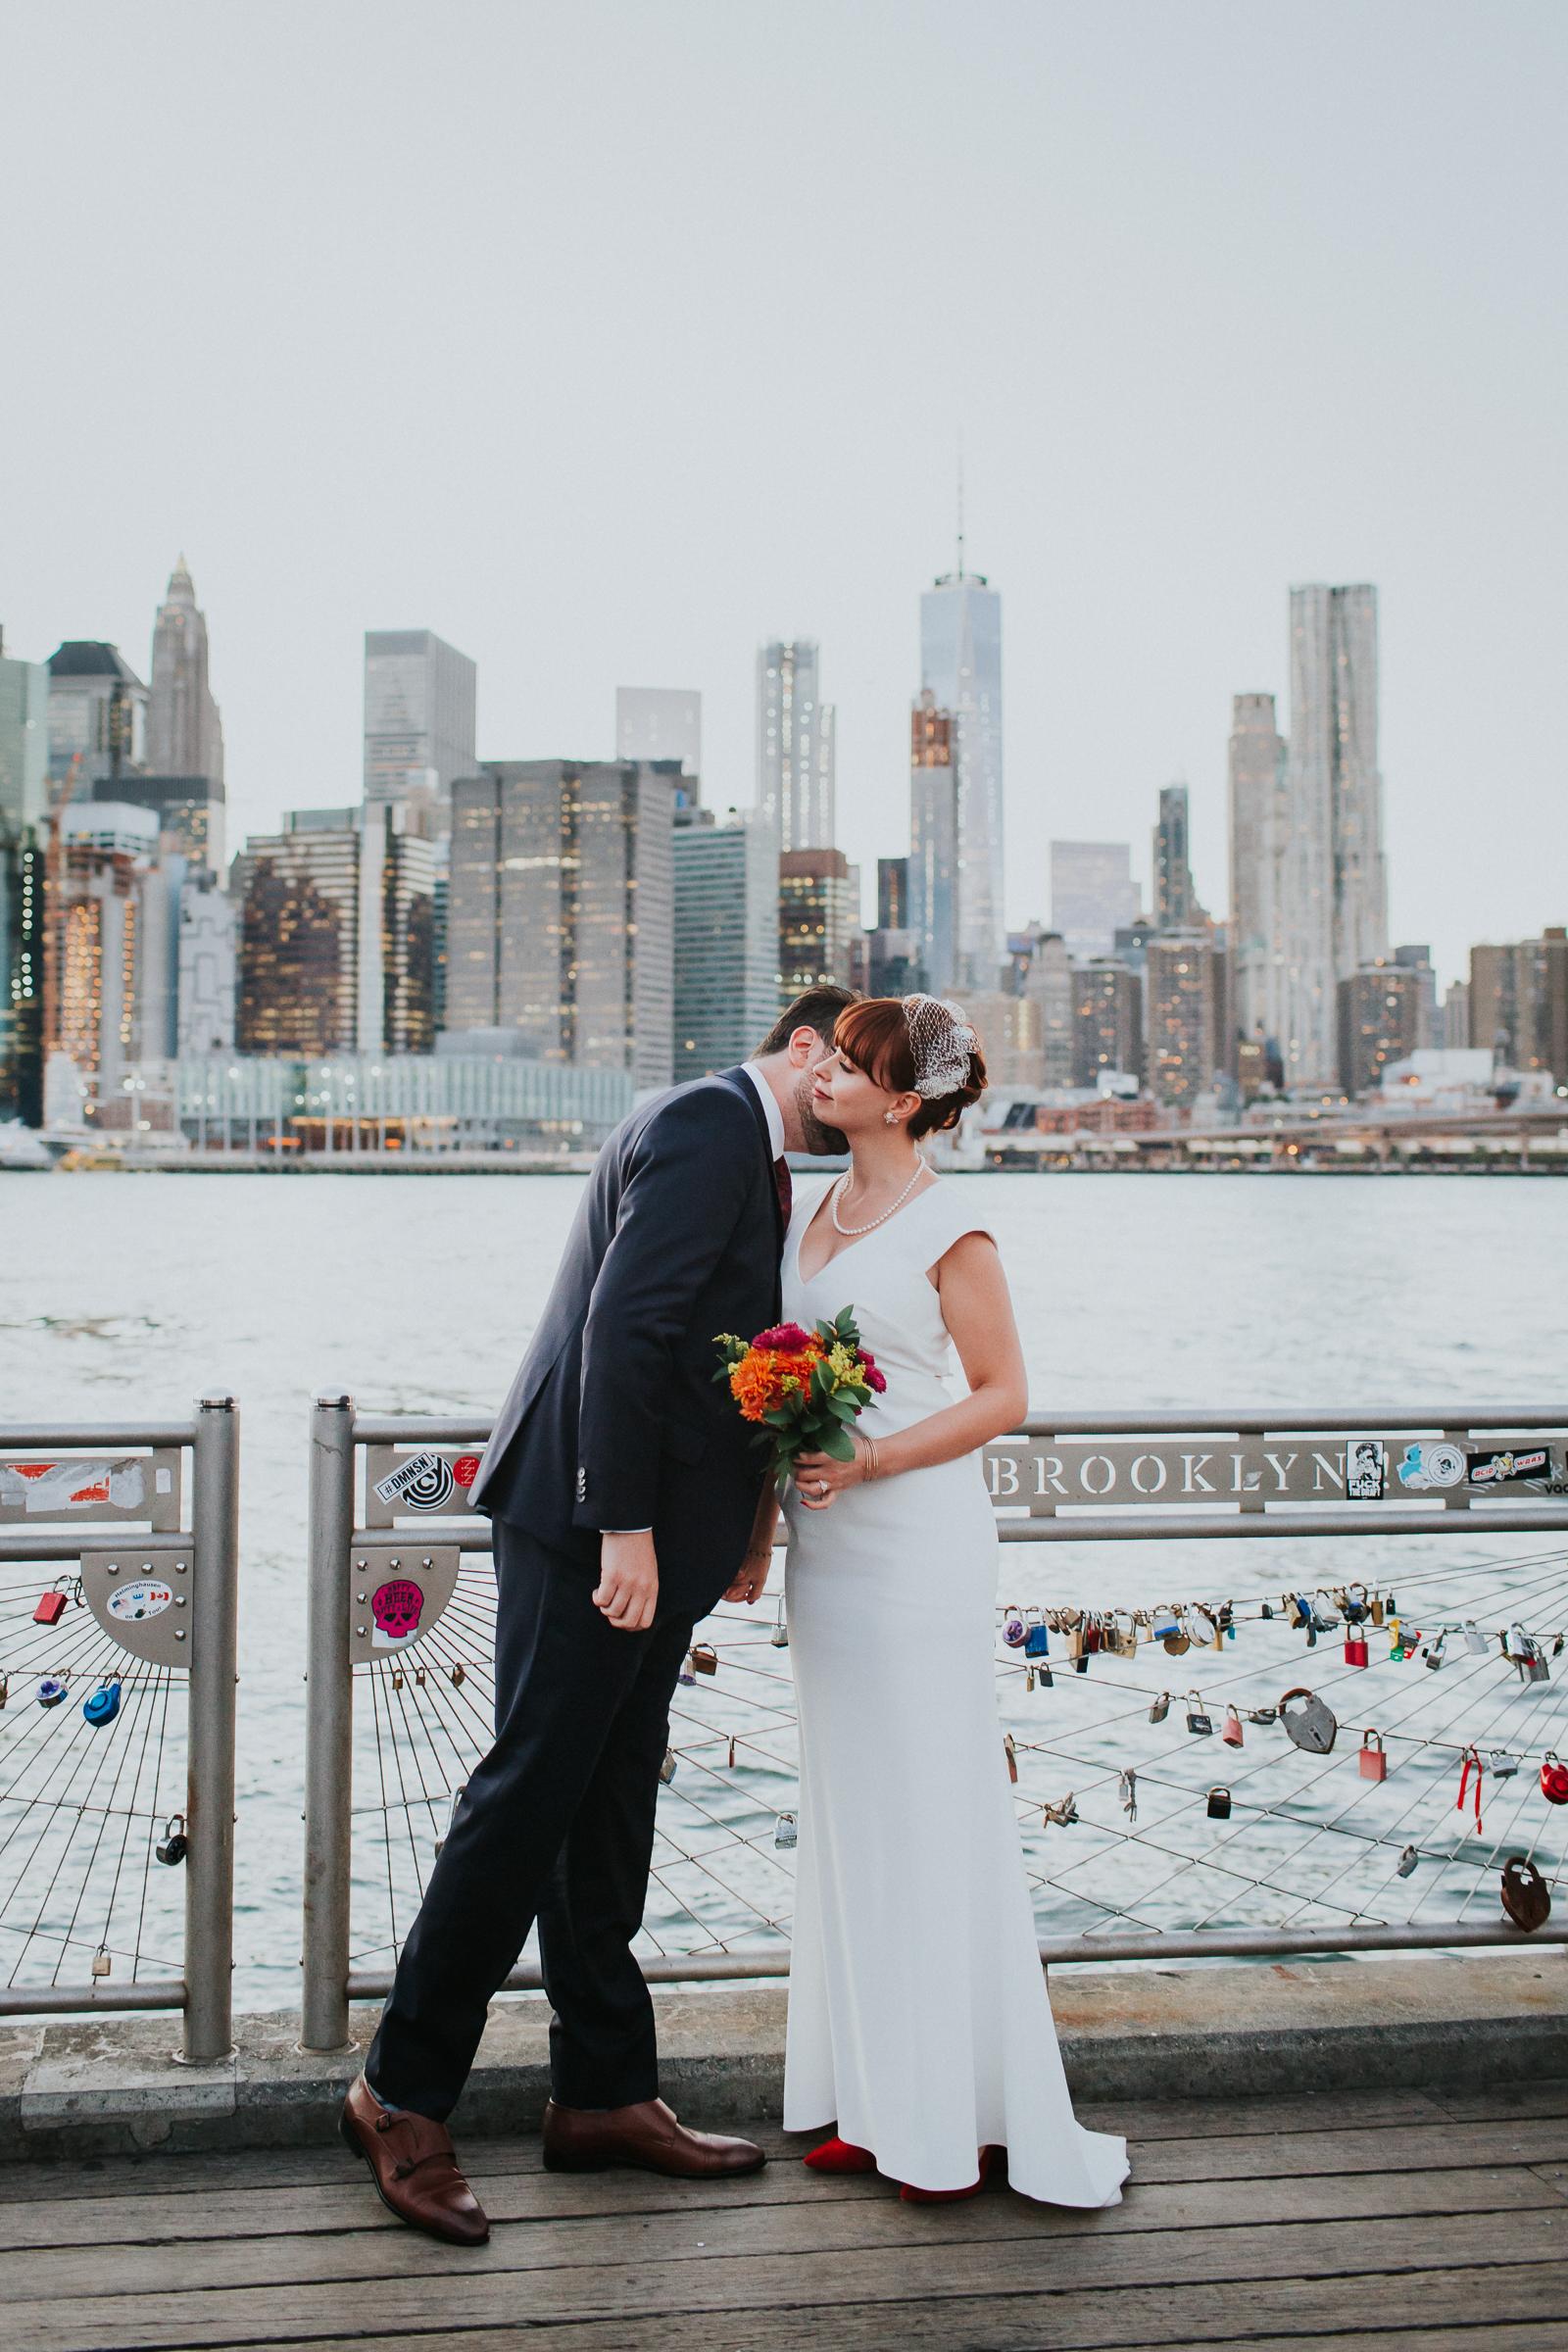 Dumbo-Brooklyn-Bridge-Park-NYC-Elopement-Documentary-Photographer-64.jpg